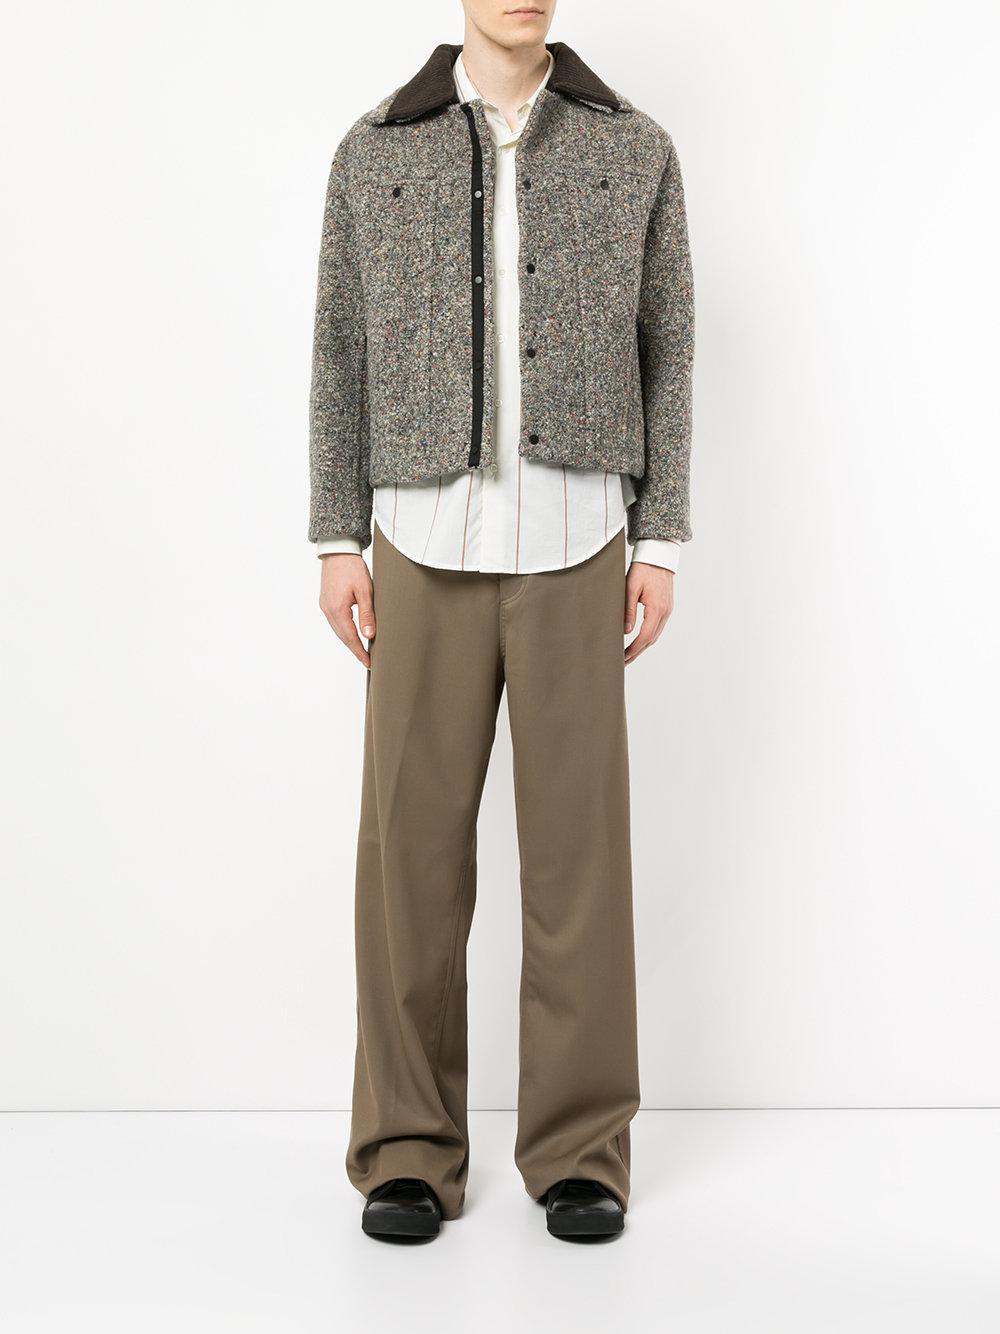 Craig Green Bomber in Grey (Grey) for Men